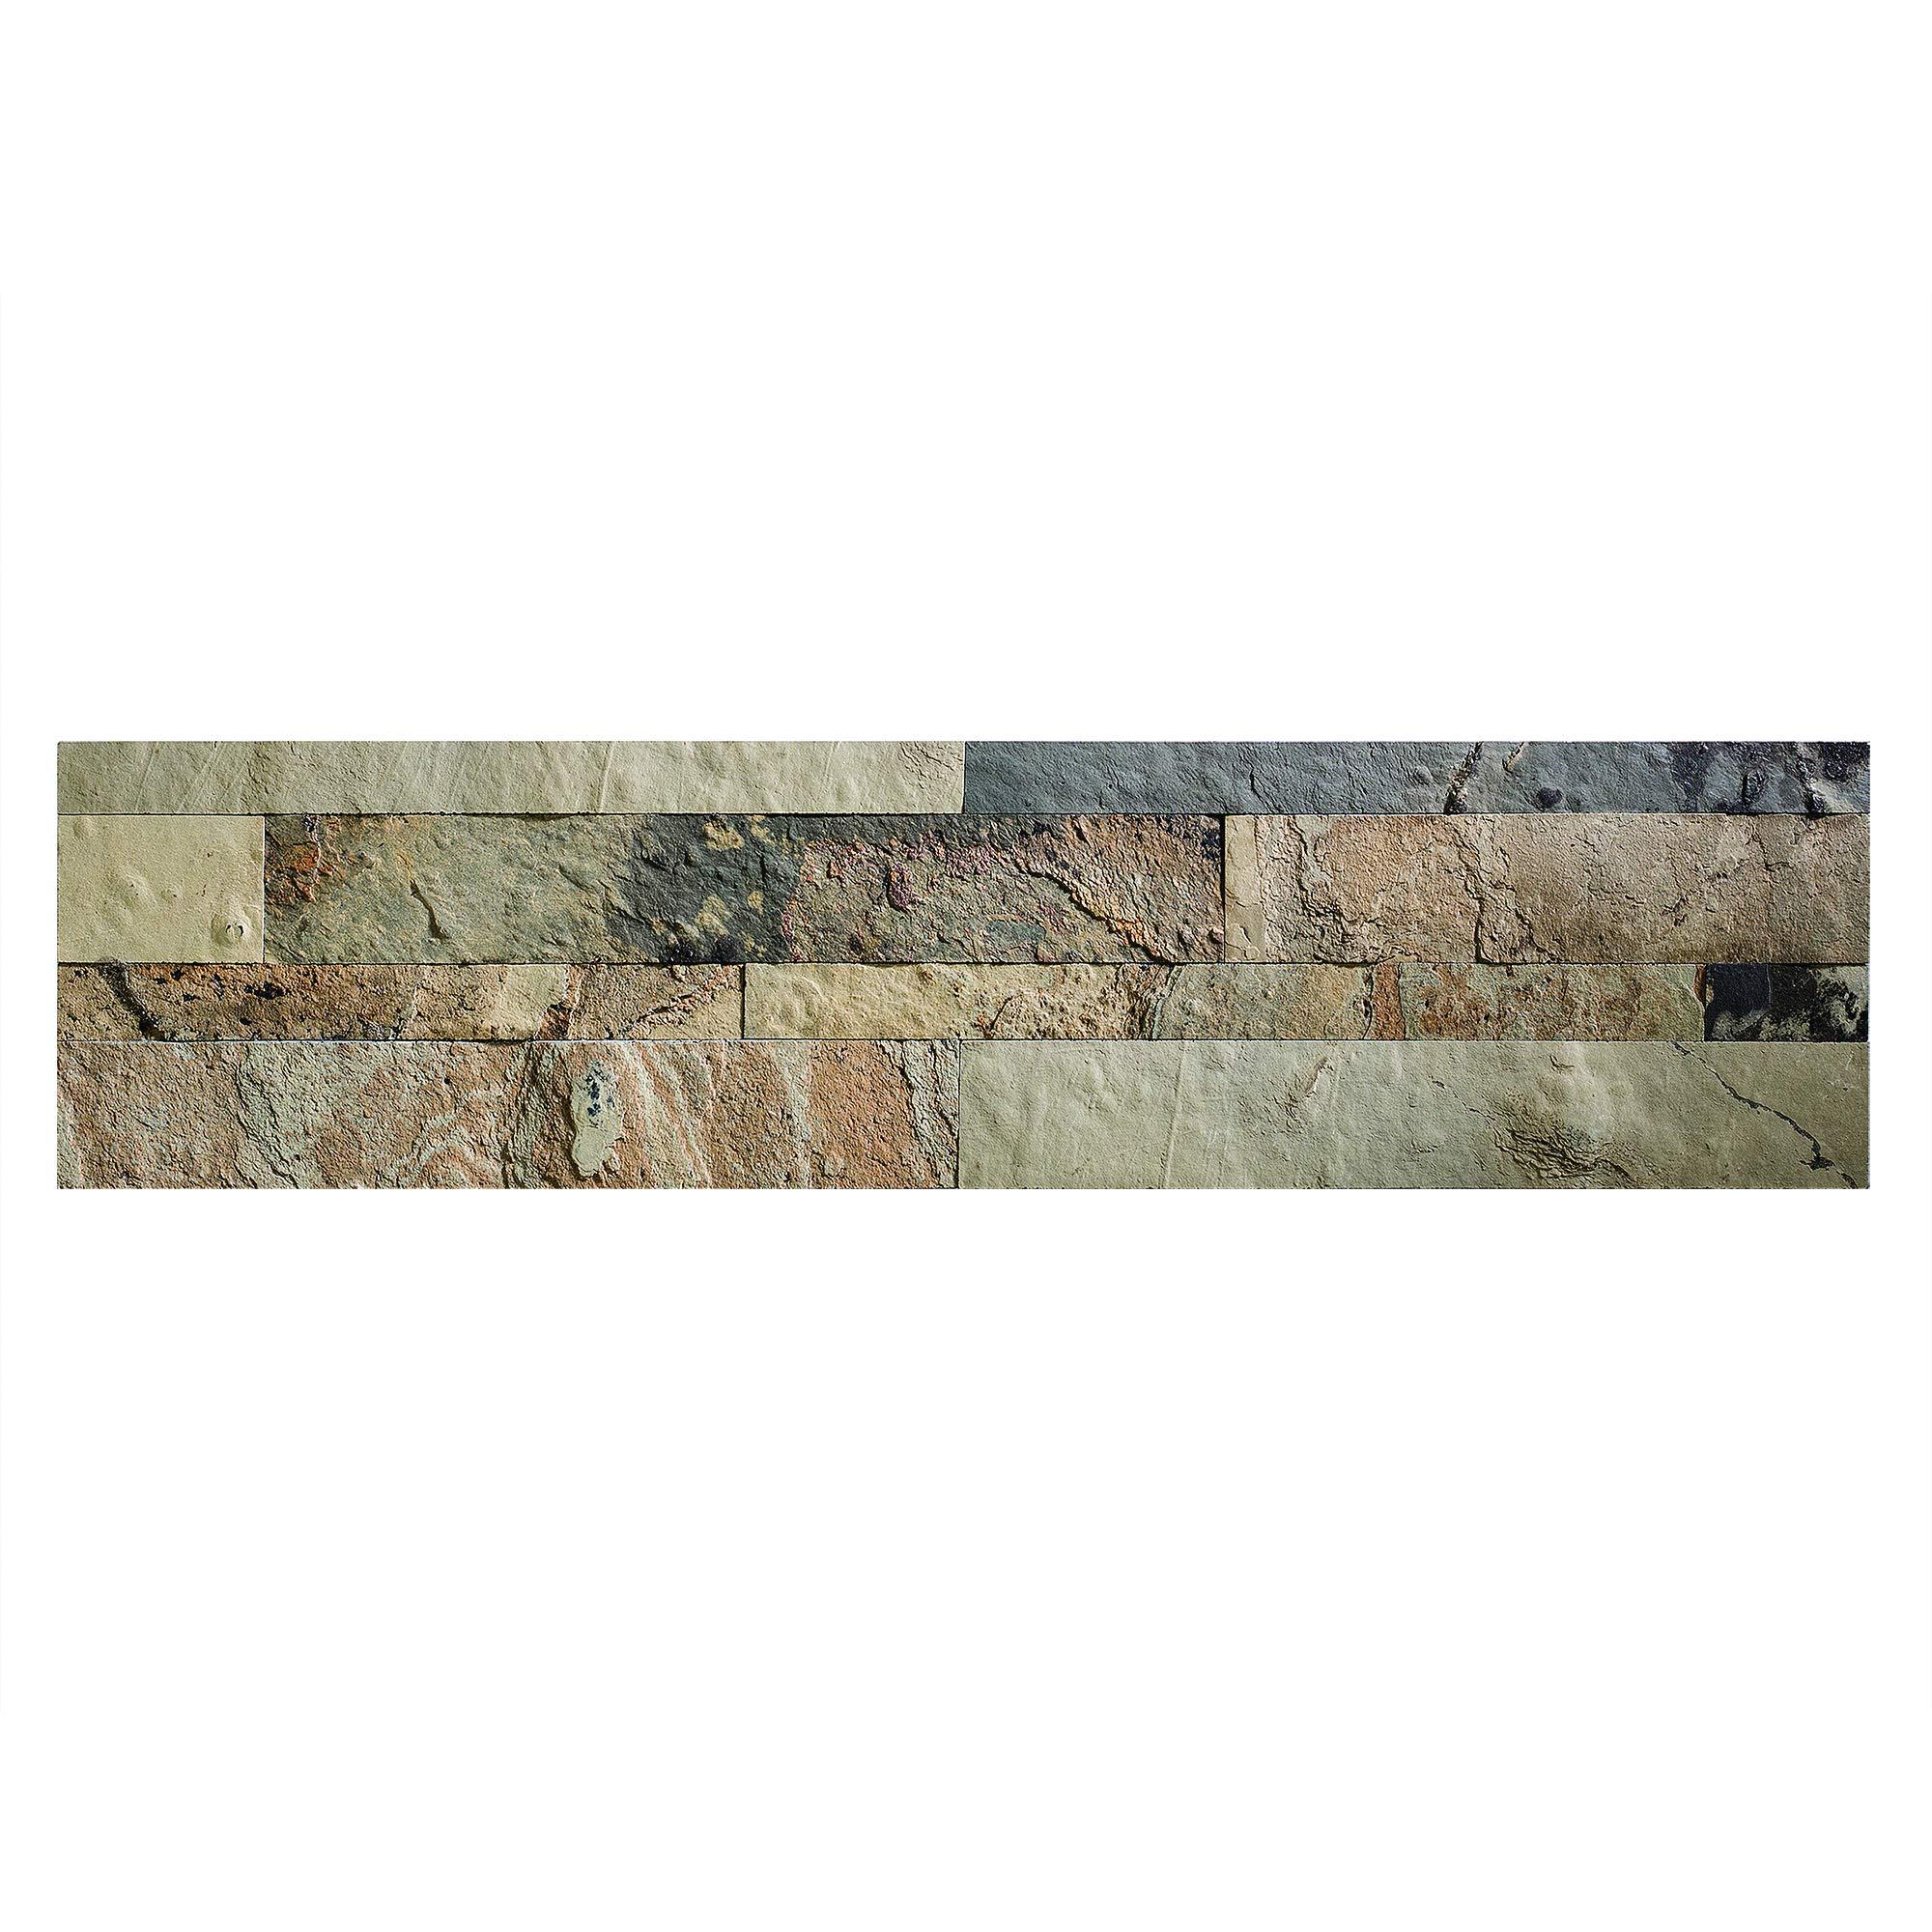 Aspect Peel and Stick Stone Overlay Kitchen Backsplash - Medley Slate (5.9'' x 23.6'' x 1/8'' Panel - Approx. 1 sq ft) - Easy DIY Tile Backsplash by Aspect